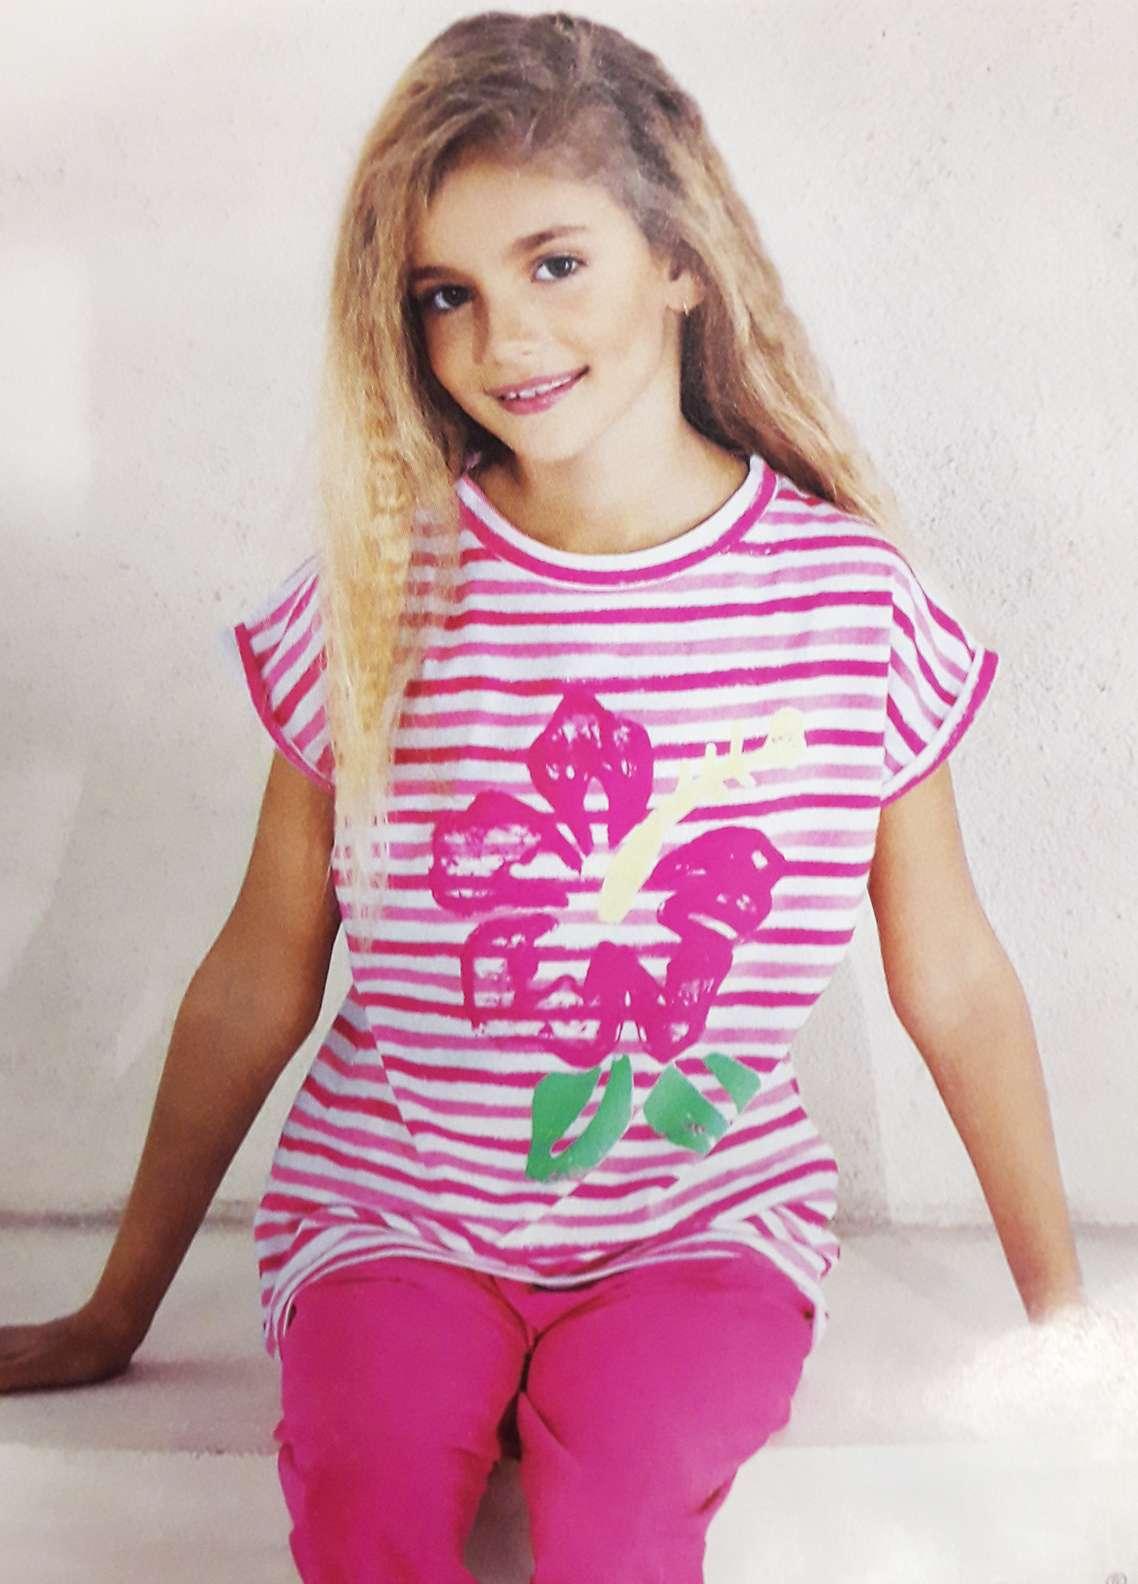 Cotton Net Nightwear for Kids 2 Piece NS18K 7505 PINK